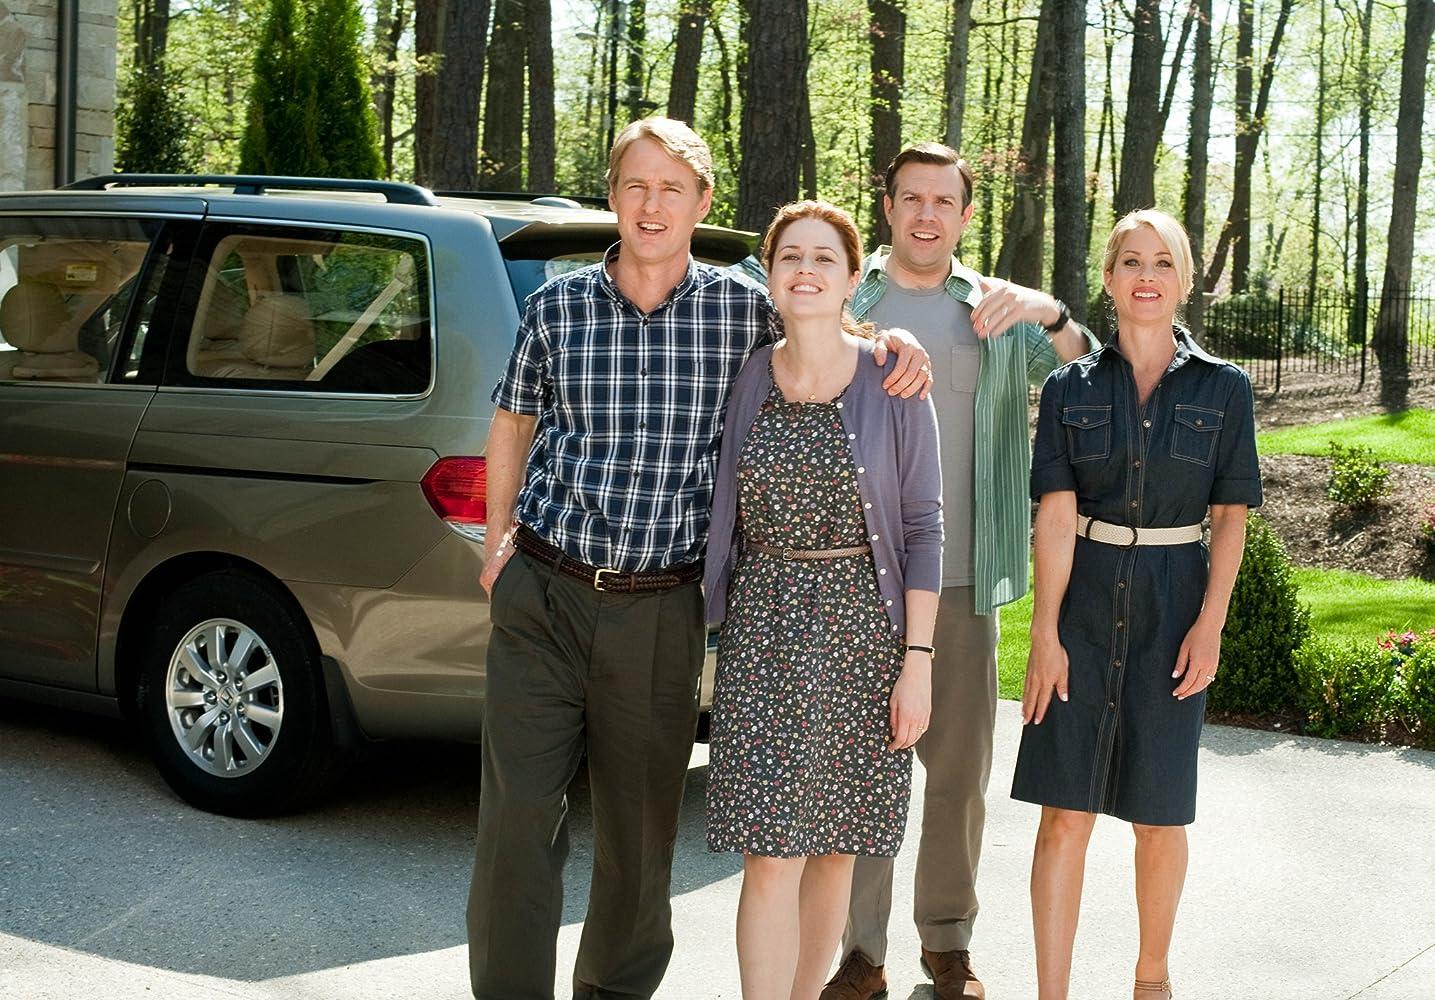 Christina Applegate, Owen Wilson, Jenna Fischer, and Jason Sudeikis in Hall Pass (2011)